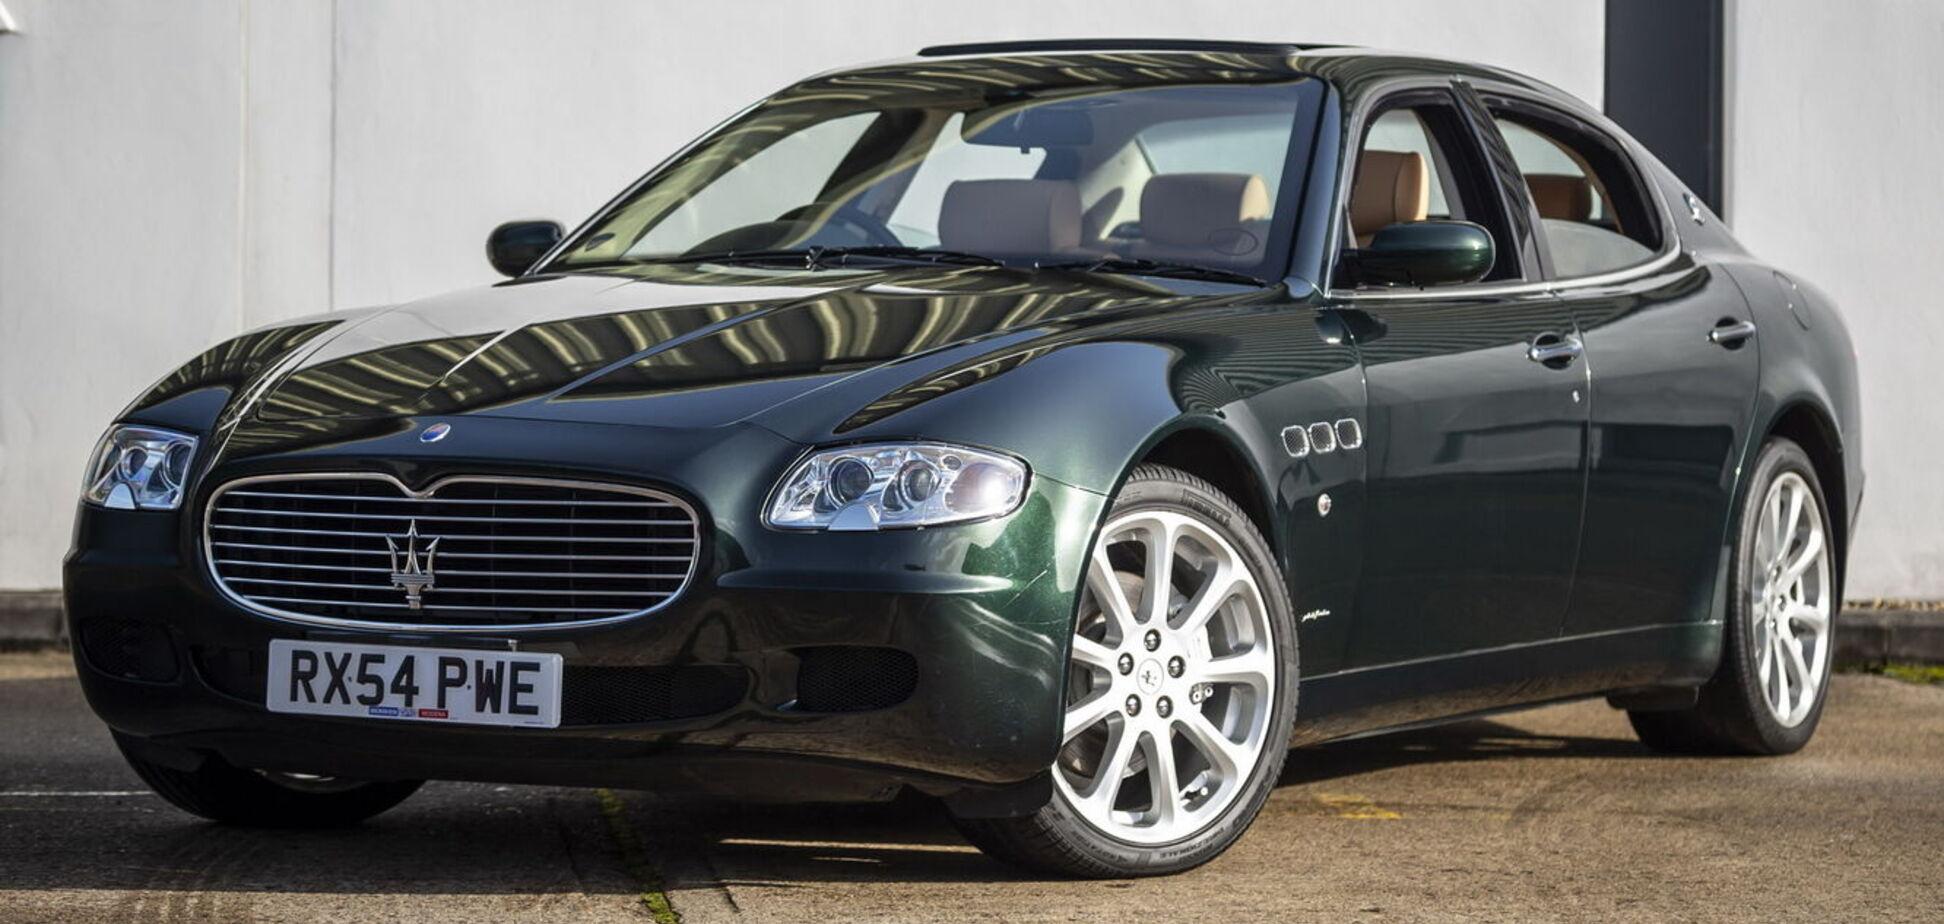 Maserati Елтона Джона продадуть на аукціоні